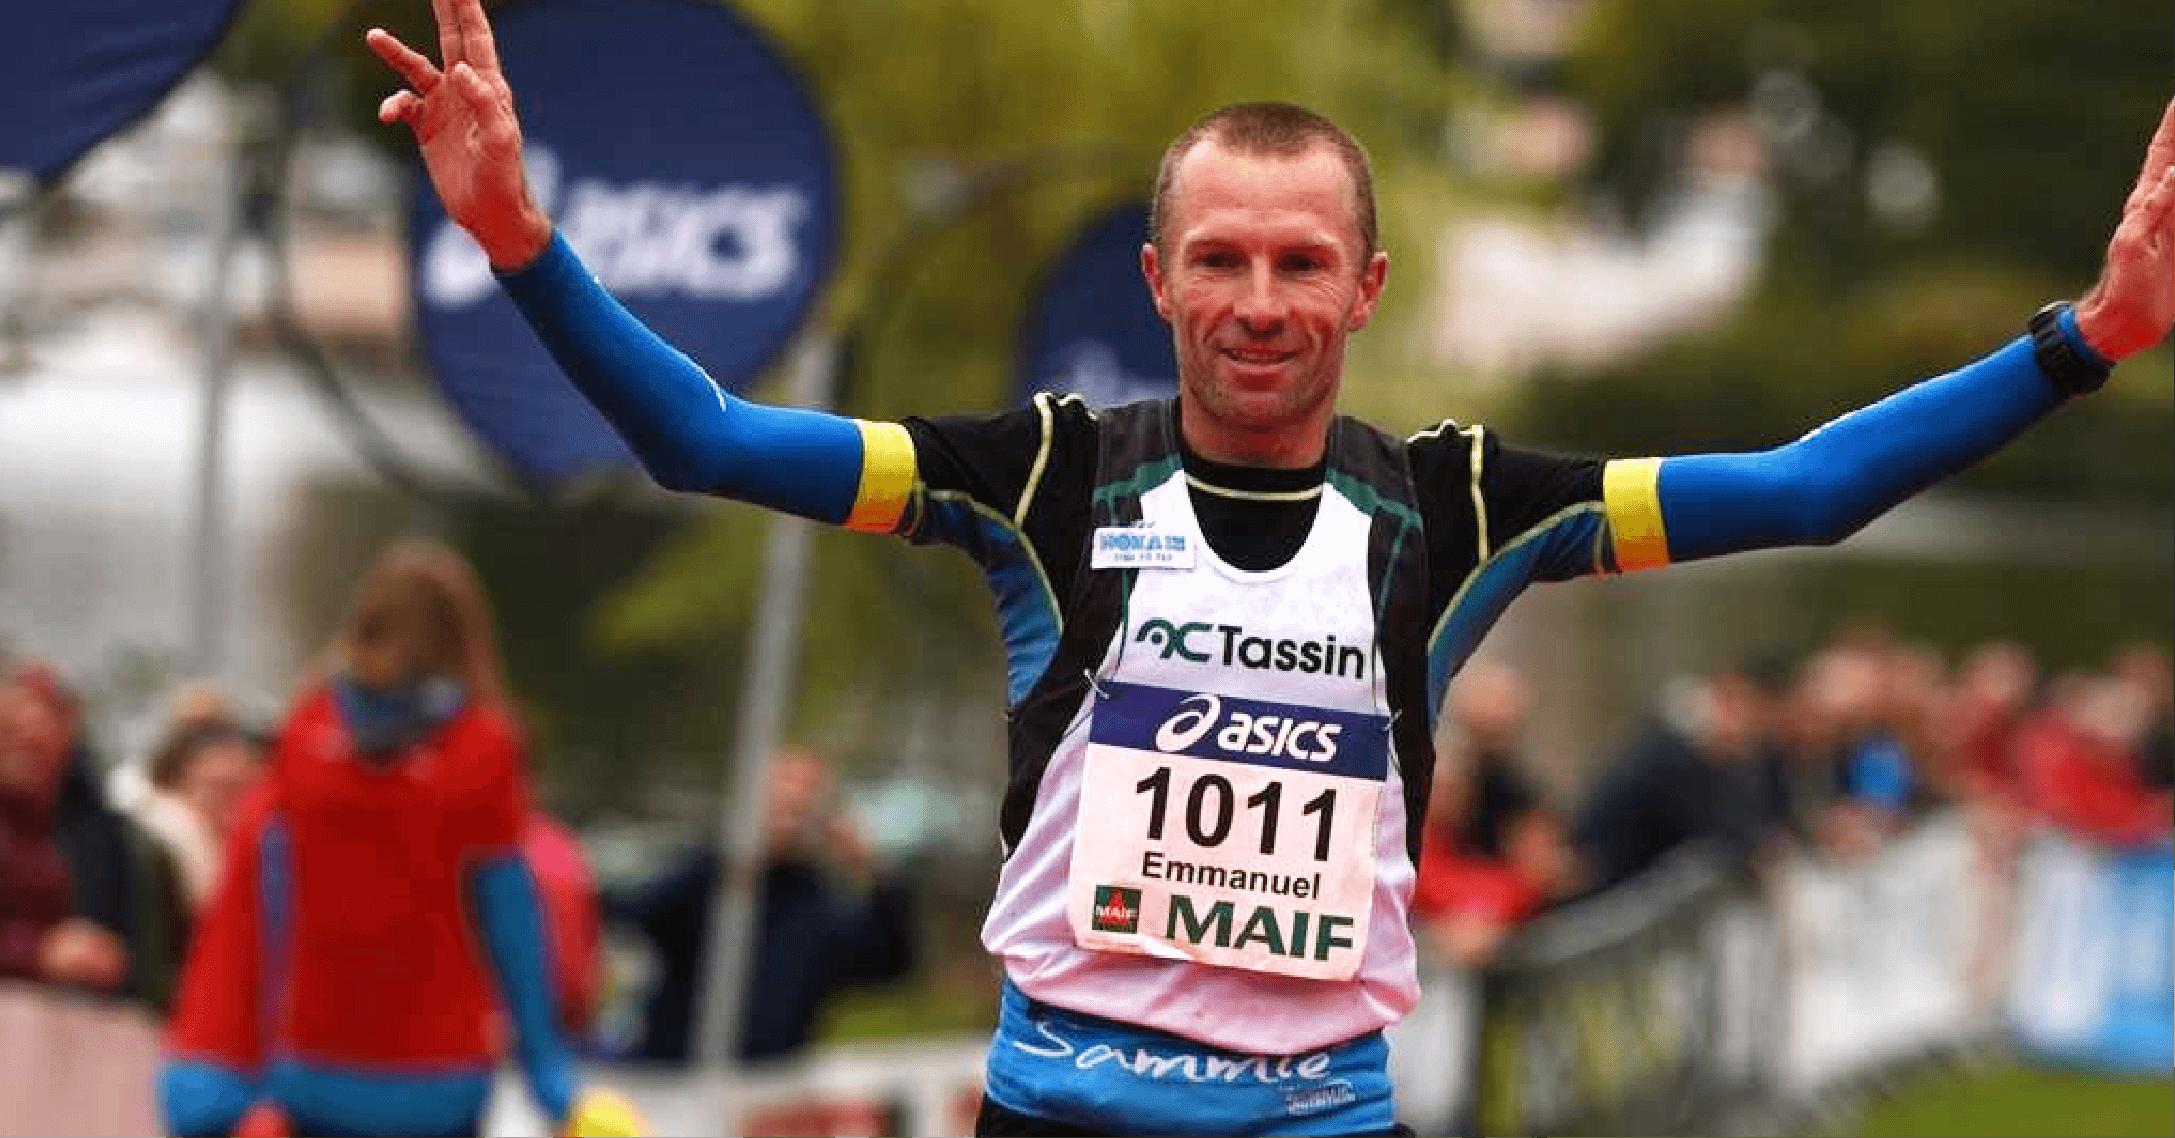 Manu Meyssat, en compétition portant la ceinture de Running Sammie®